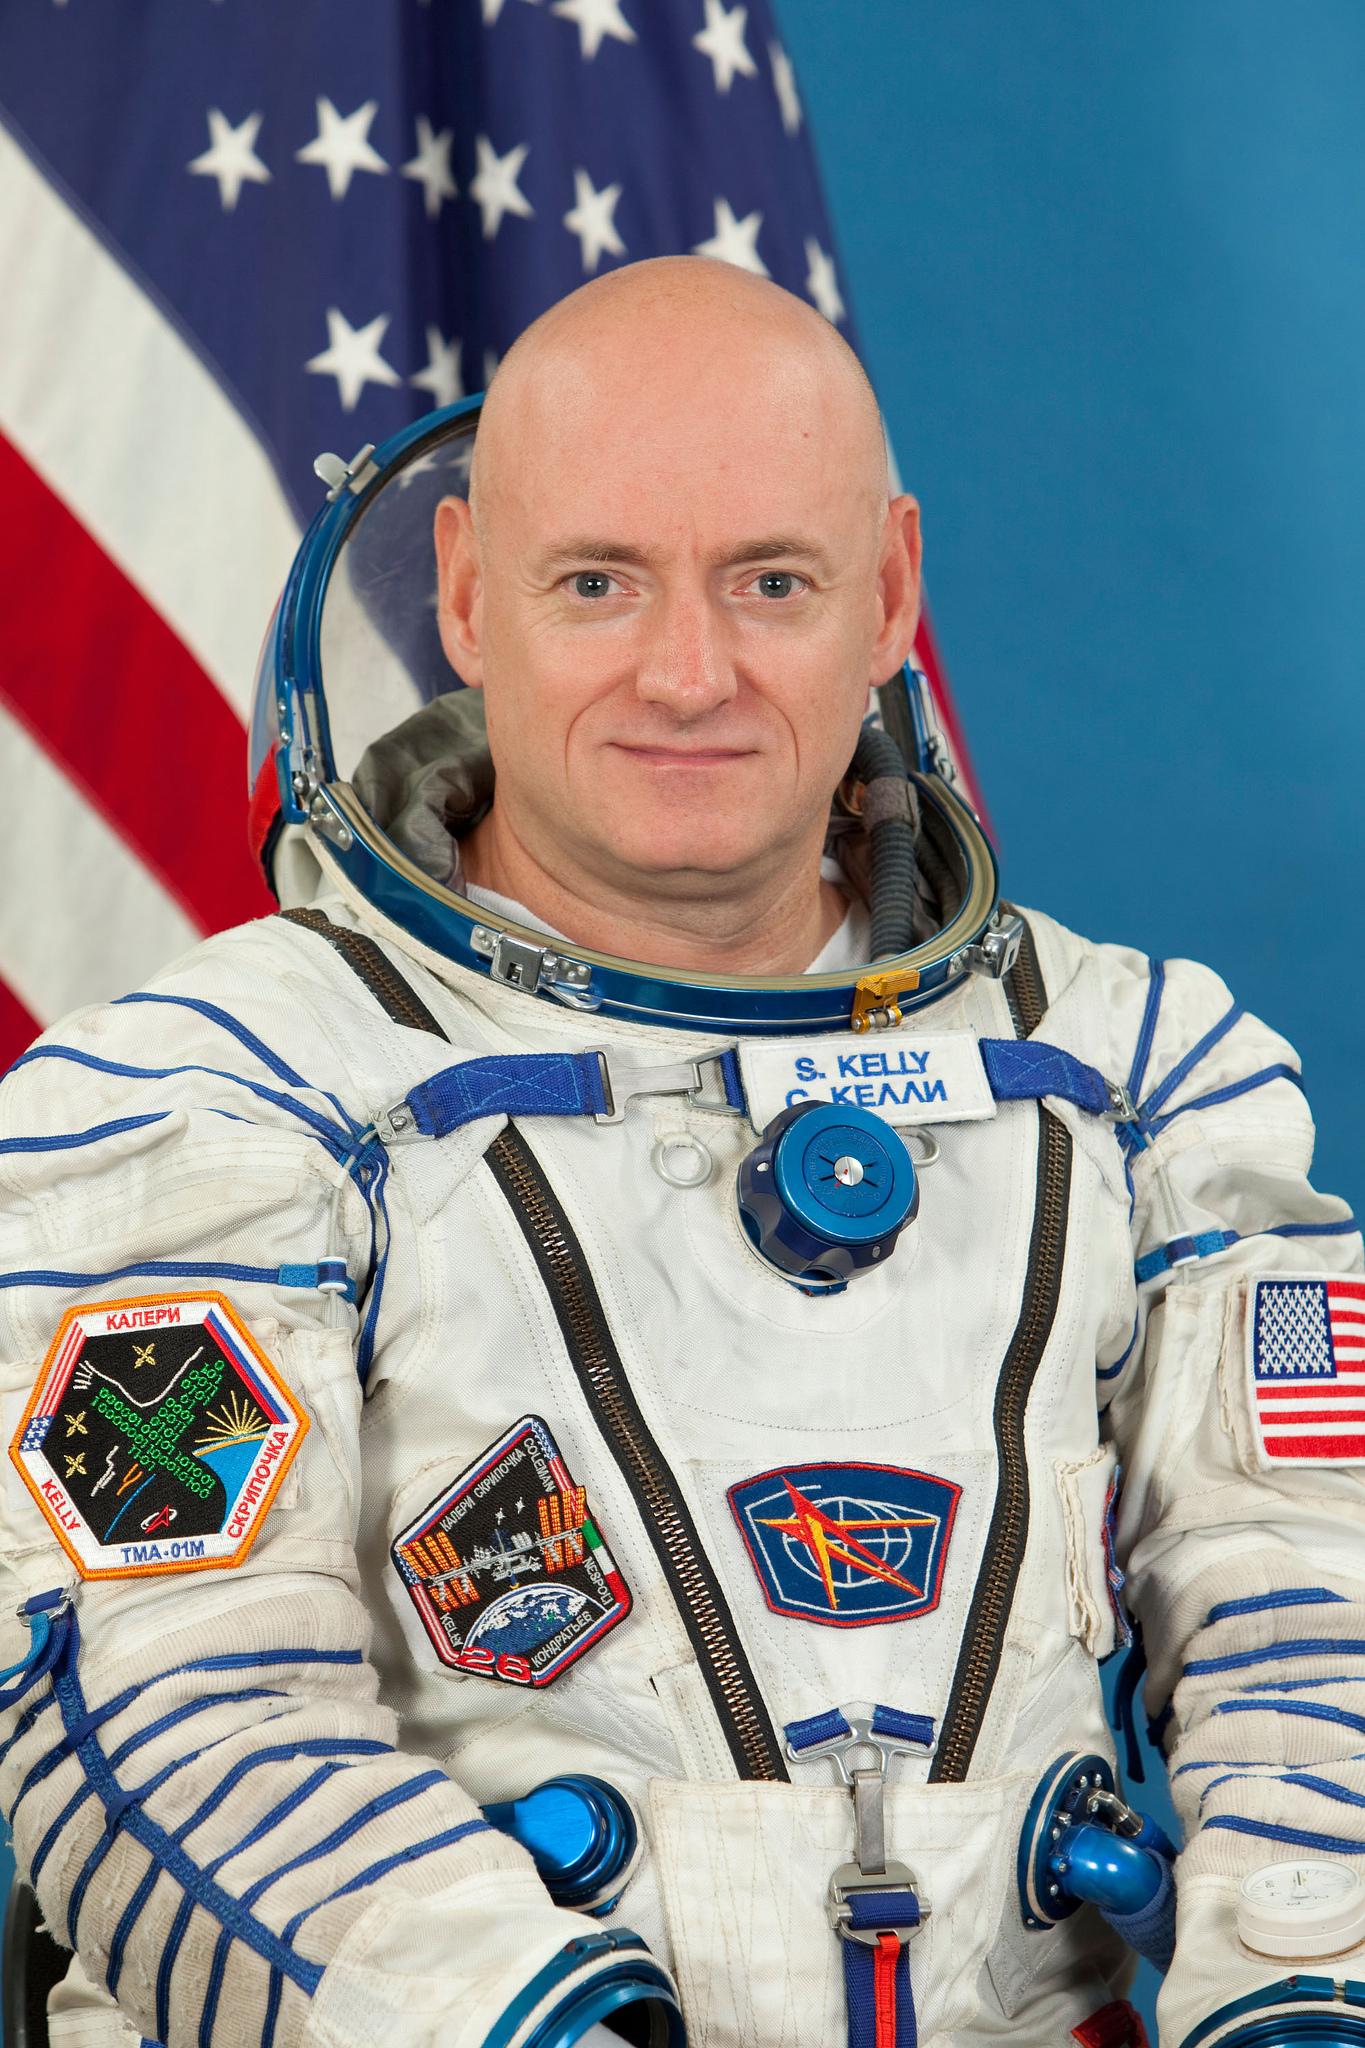 4df1de3797bfdc7cd70a_d0d44ece01d0a05b2bb8_Scott_Kelly_courtesy_NASA__1_.JPG